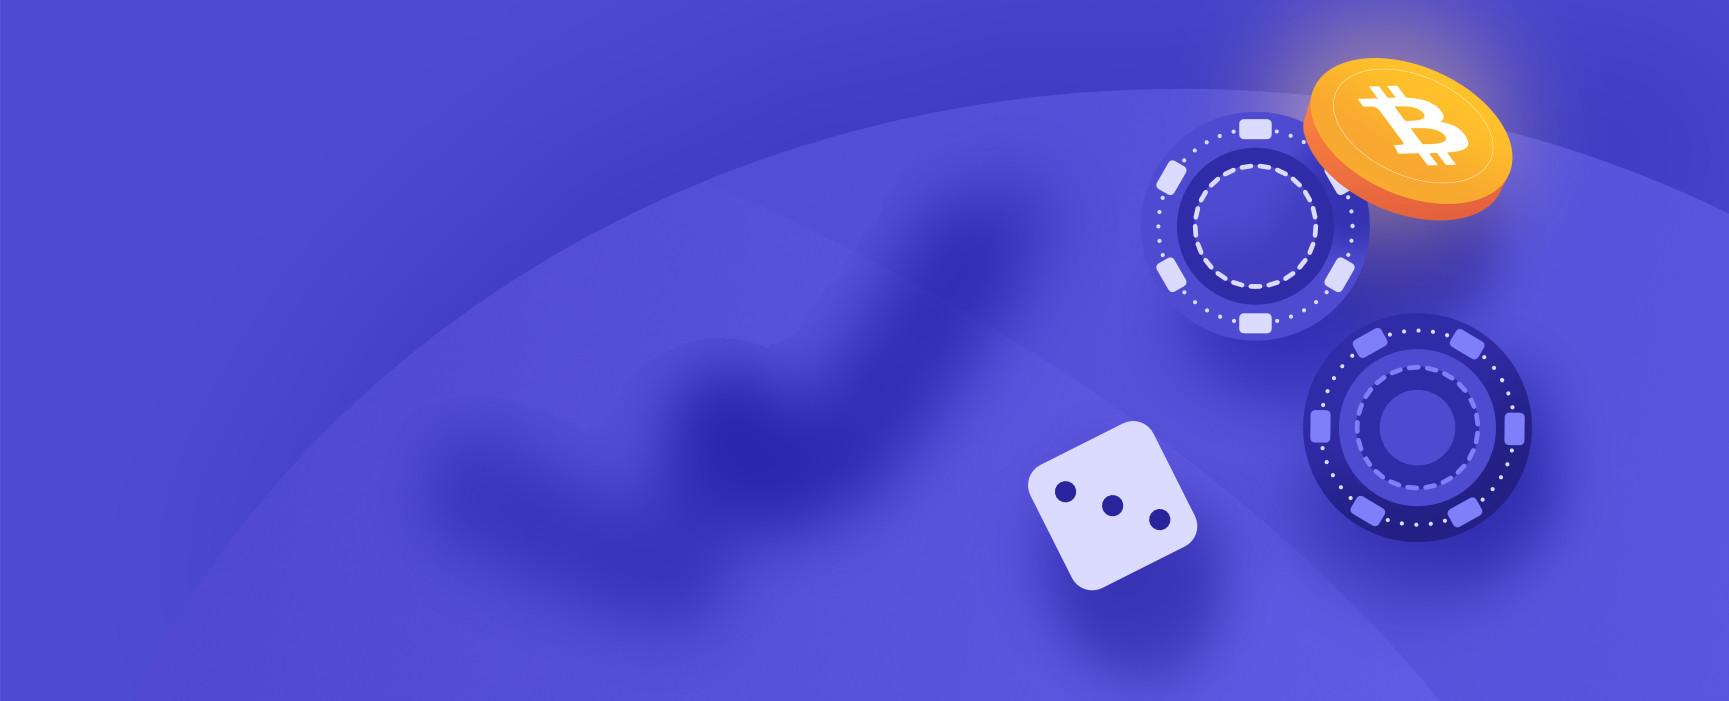 online casino work